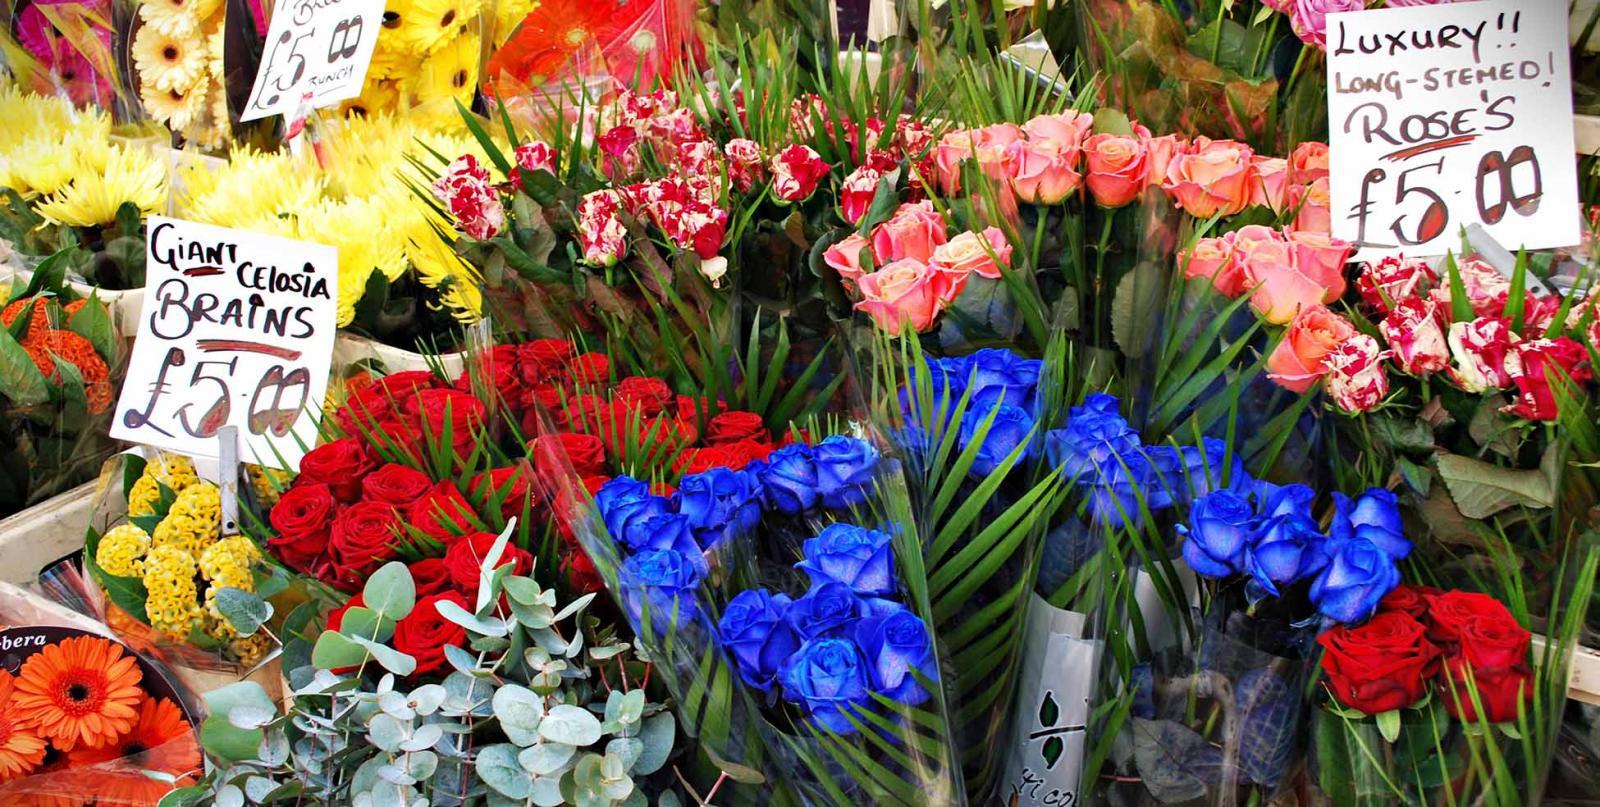 Der Columbia Road Flower Market In London 2020